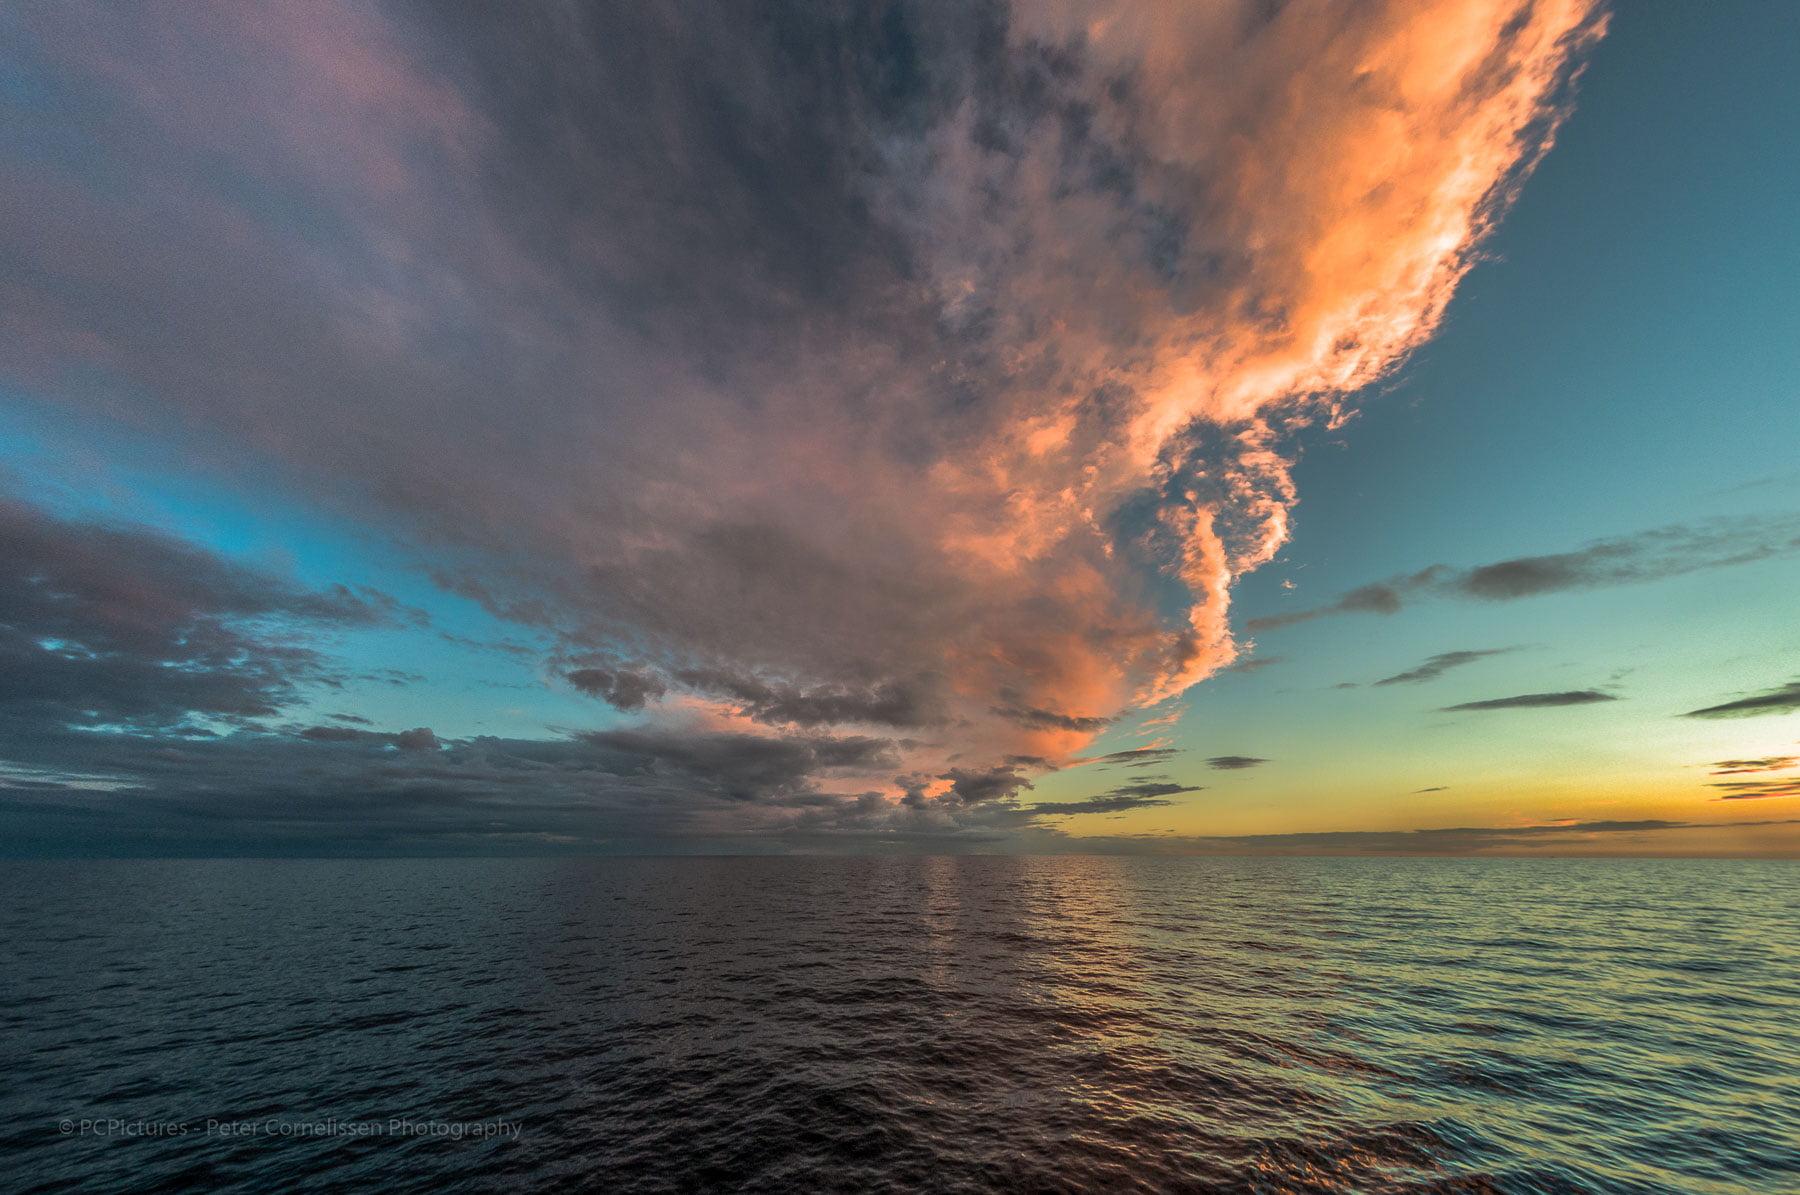 Clouds, Foto catagoriëen, Seascape, St George Channel, Sunset, Zonsondergang, lken, pcpictures.nl, zeegezicht